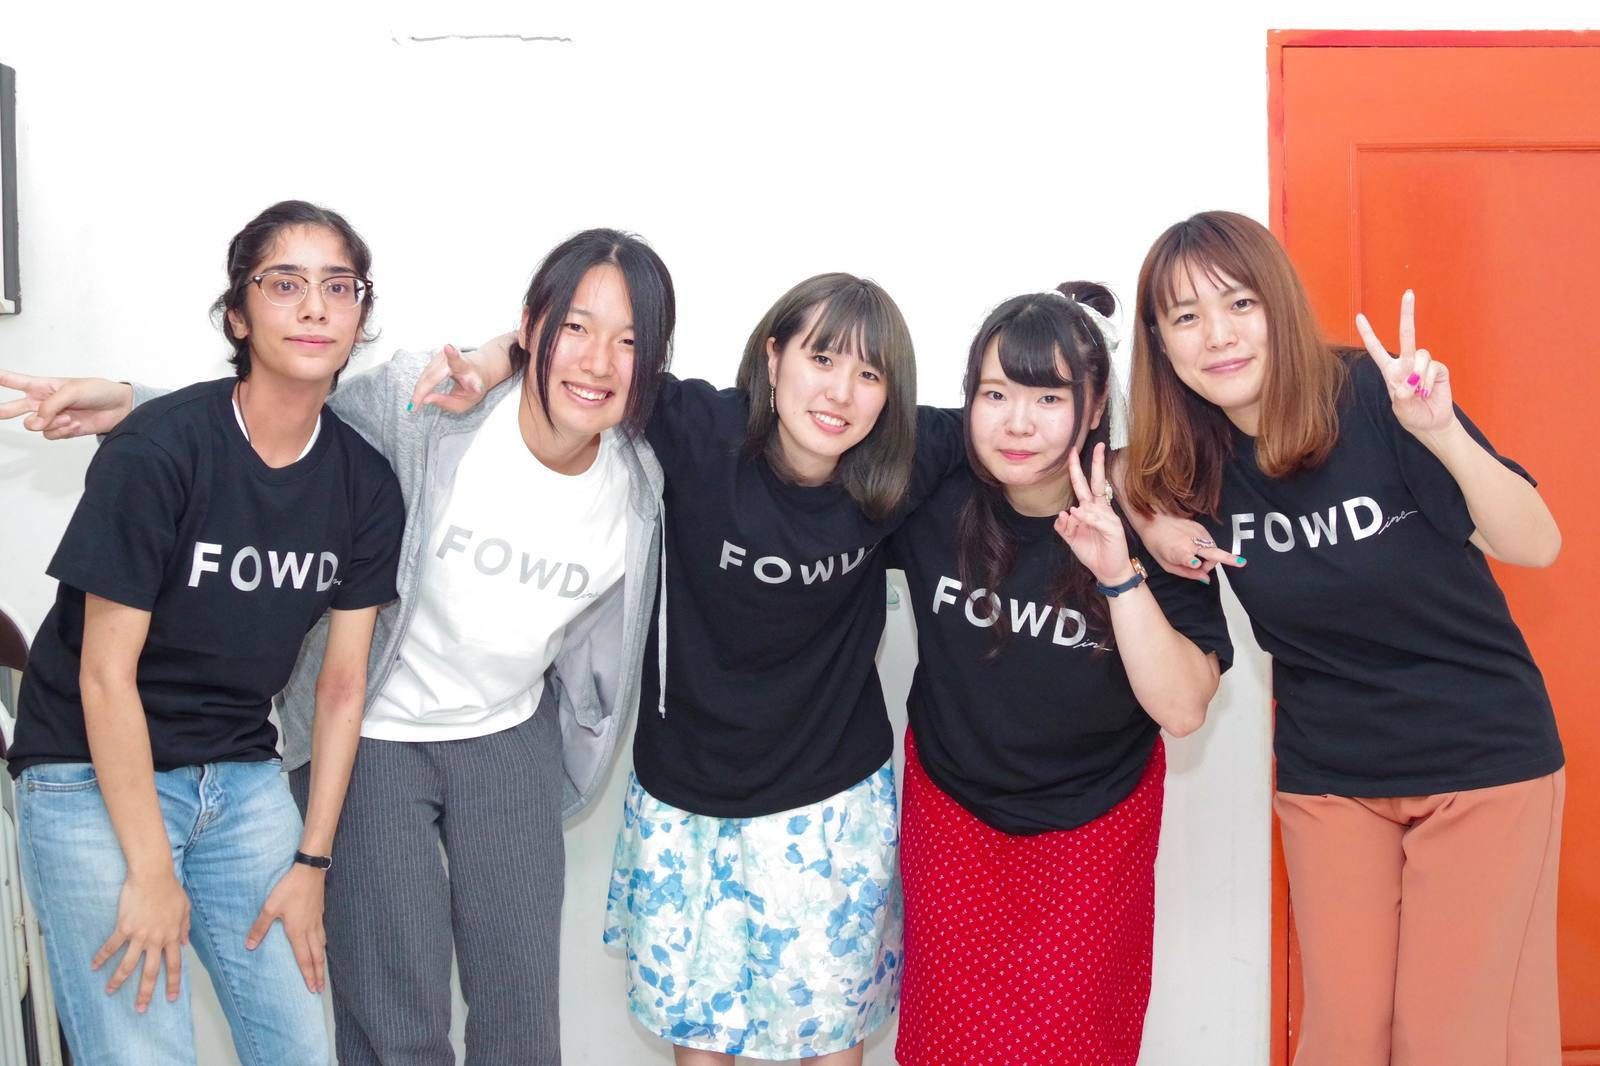 【Ruby】エンタメ業界で働きたい!チャット小説アプリを展開する企業にて、サーバーサイドエンジニアを募集!